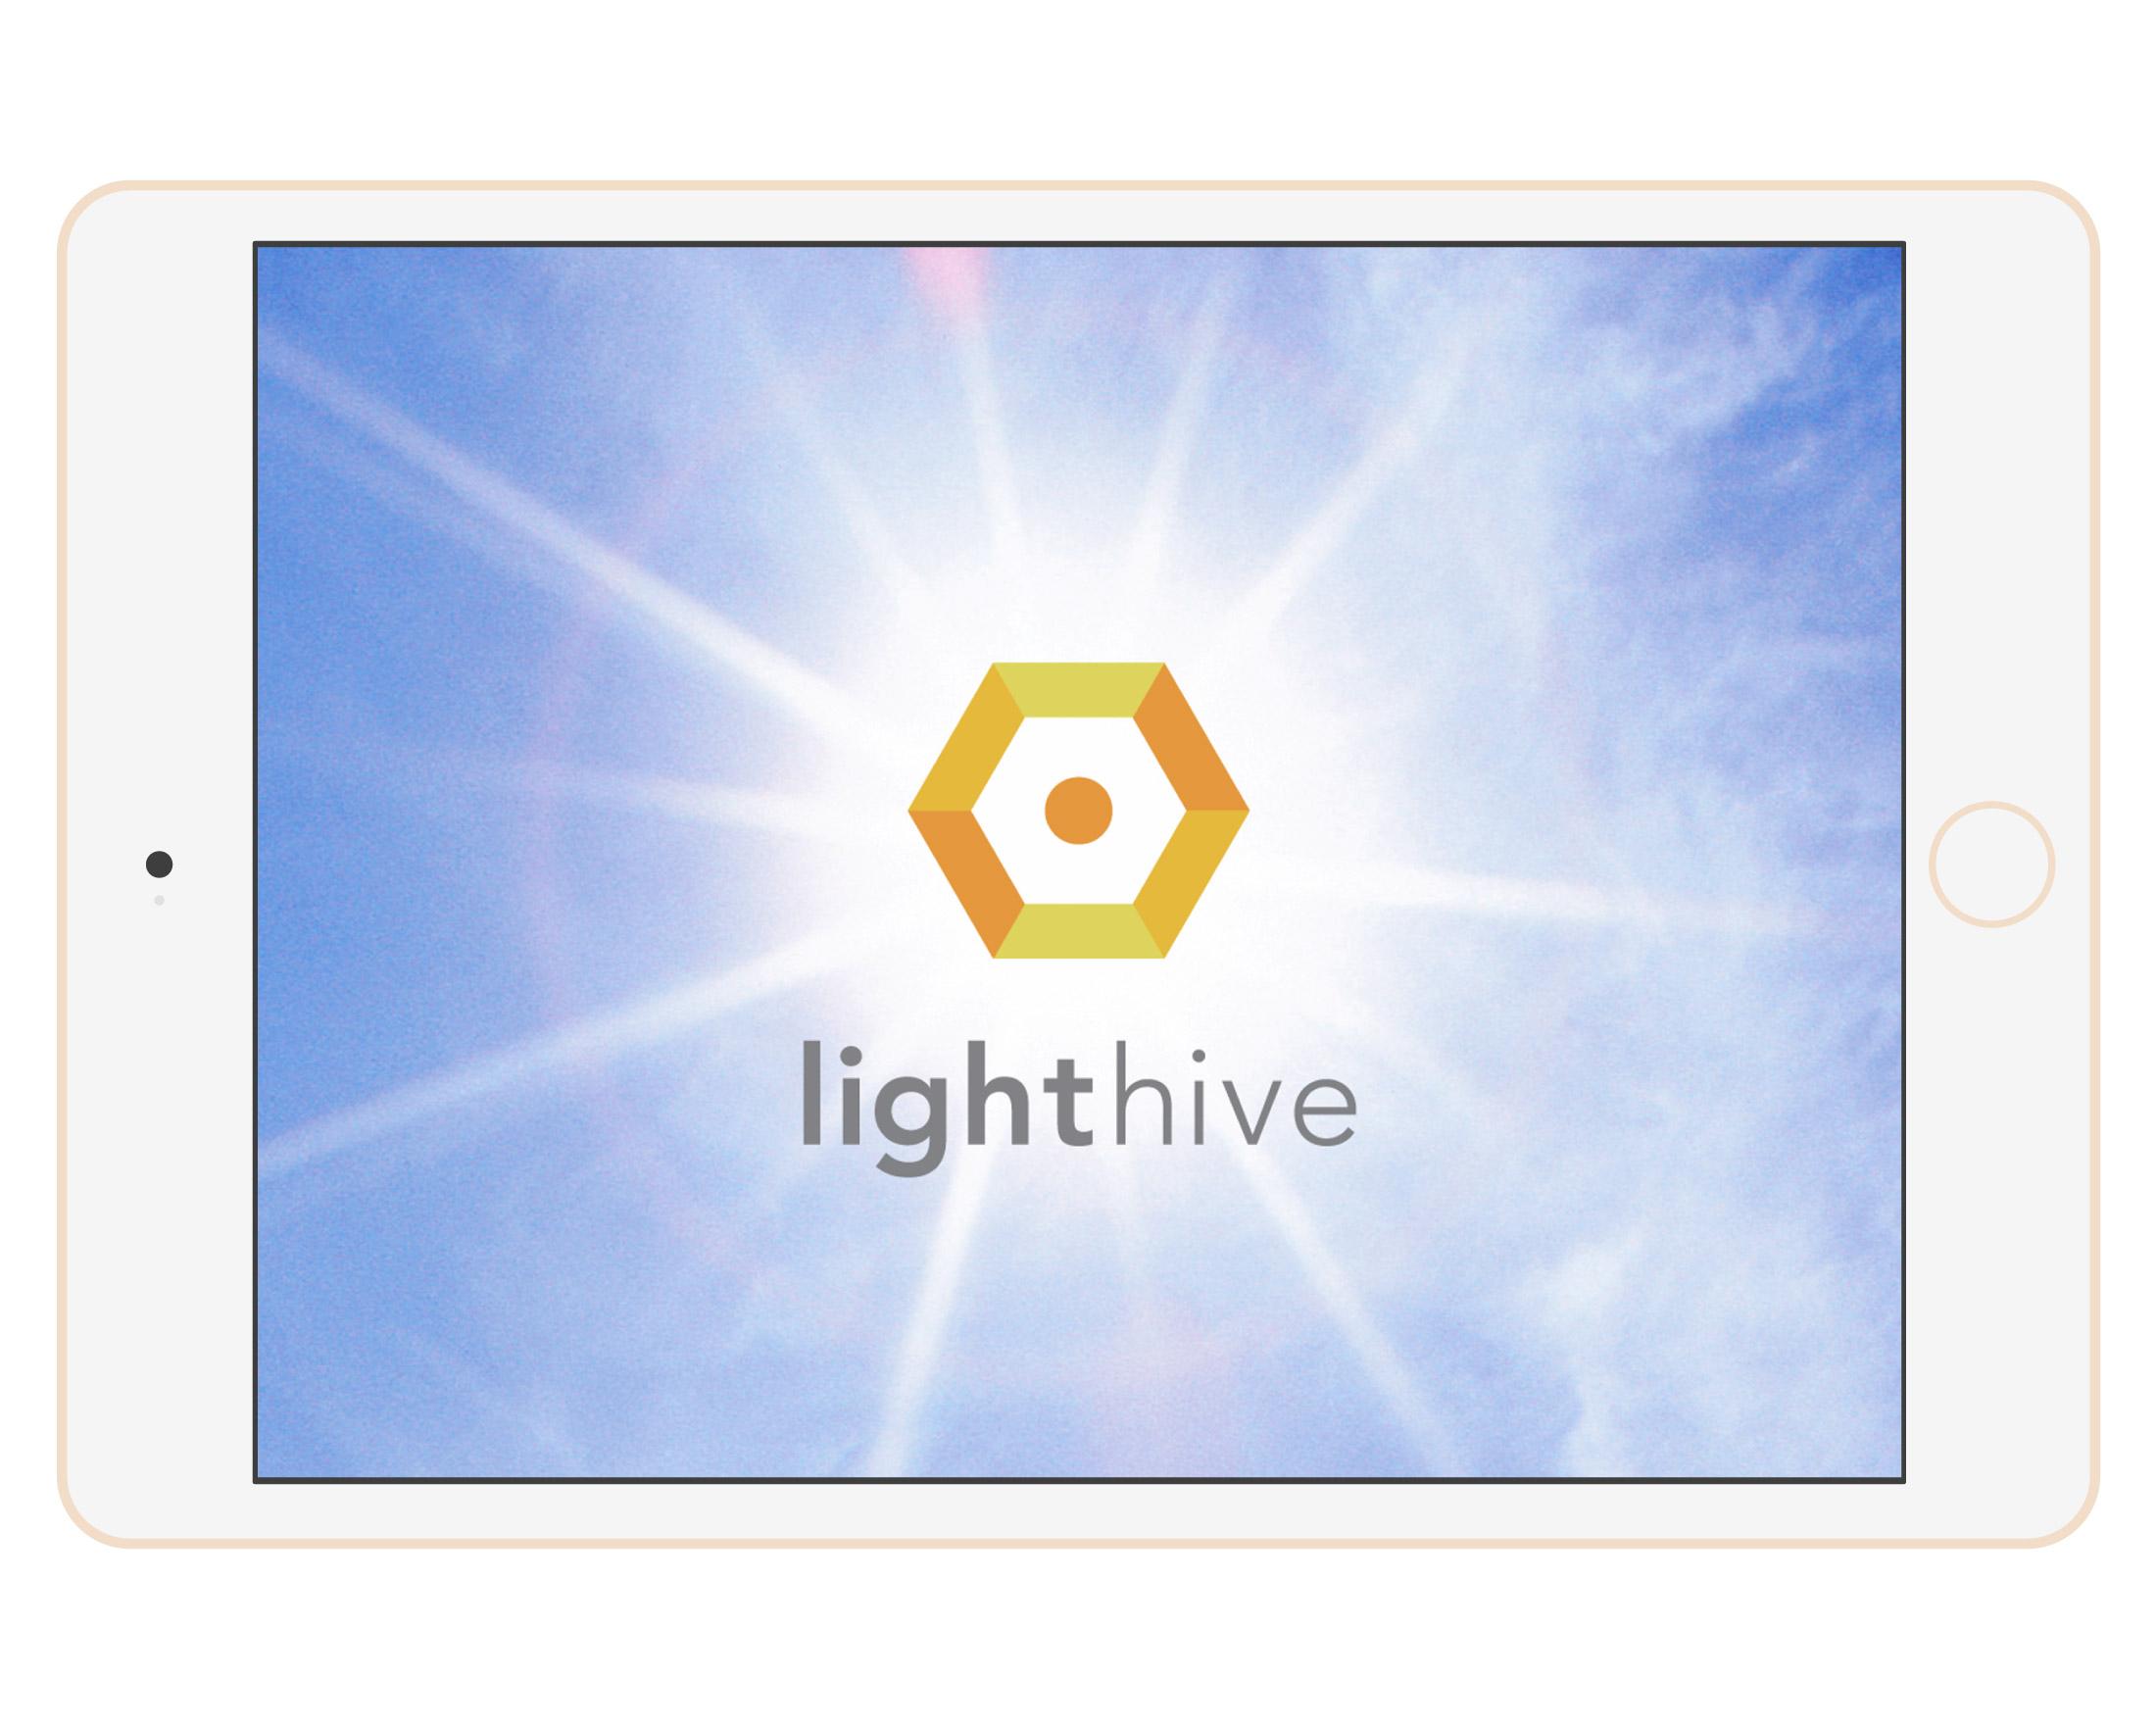 Lighthive-1